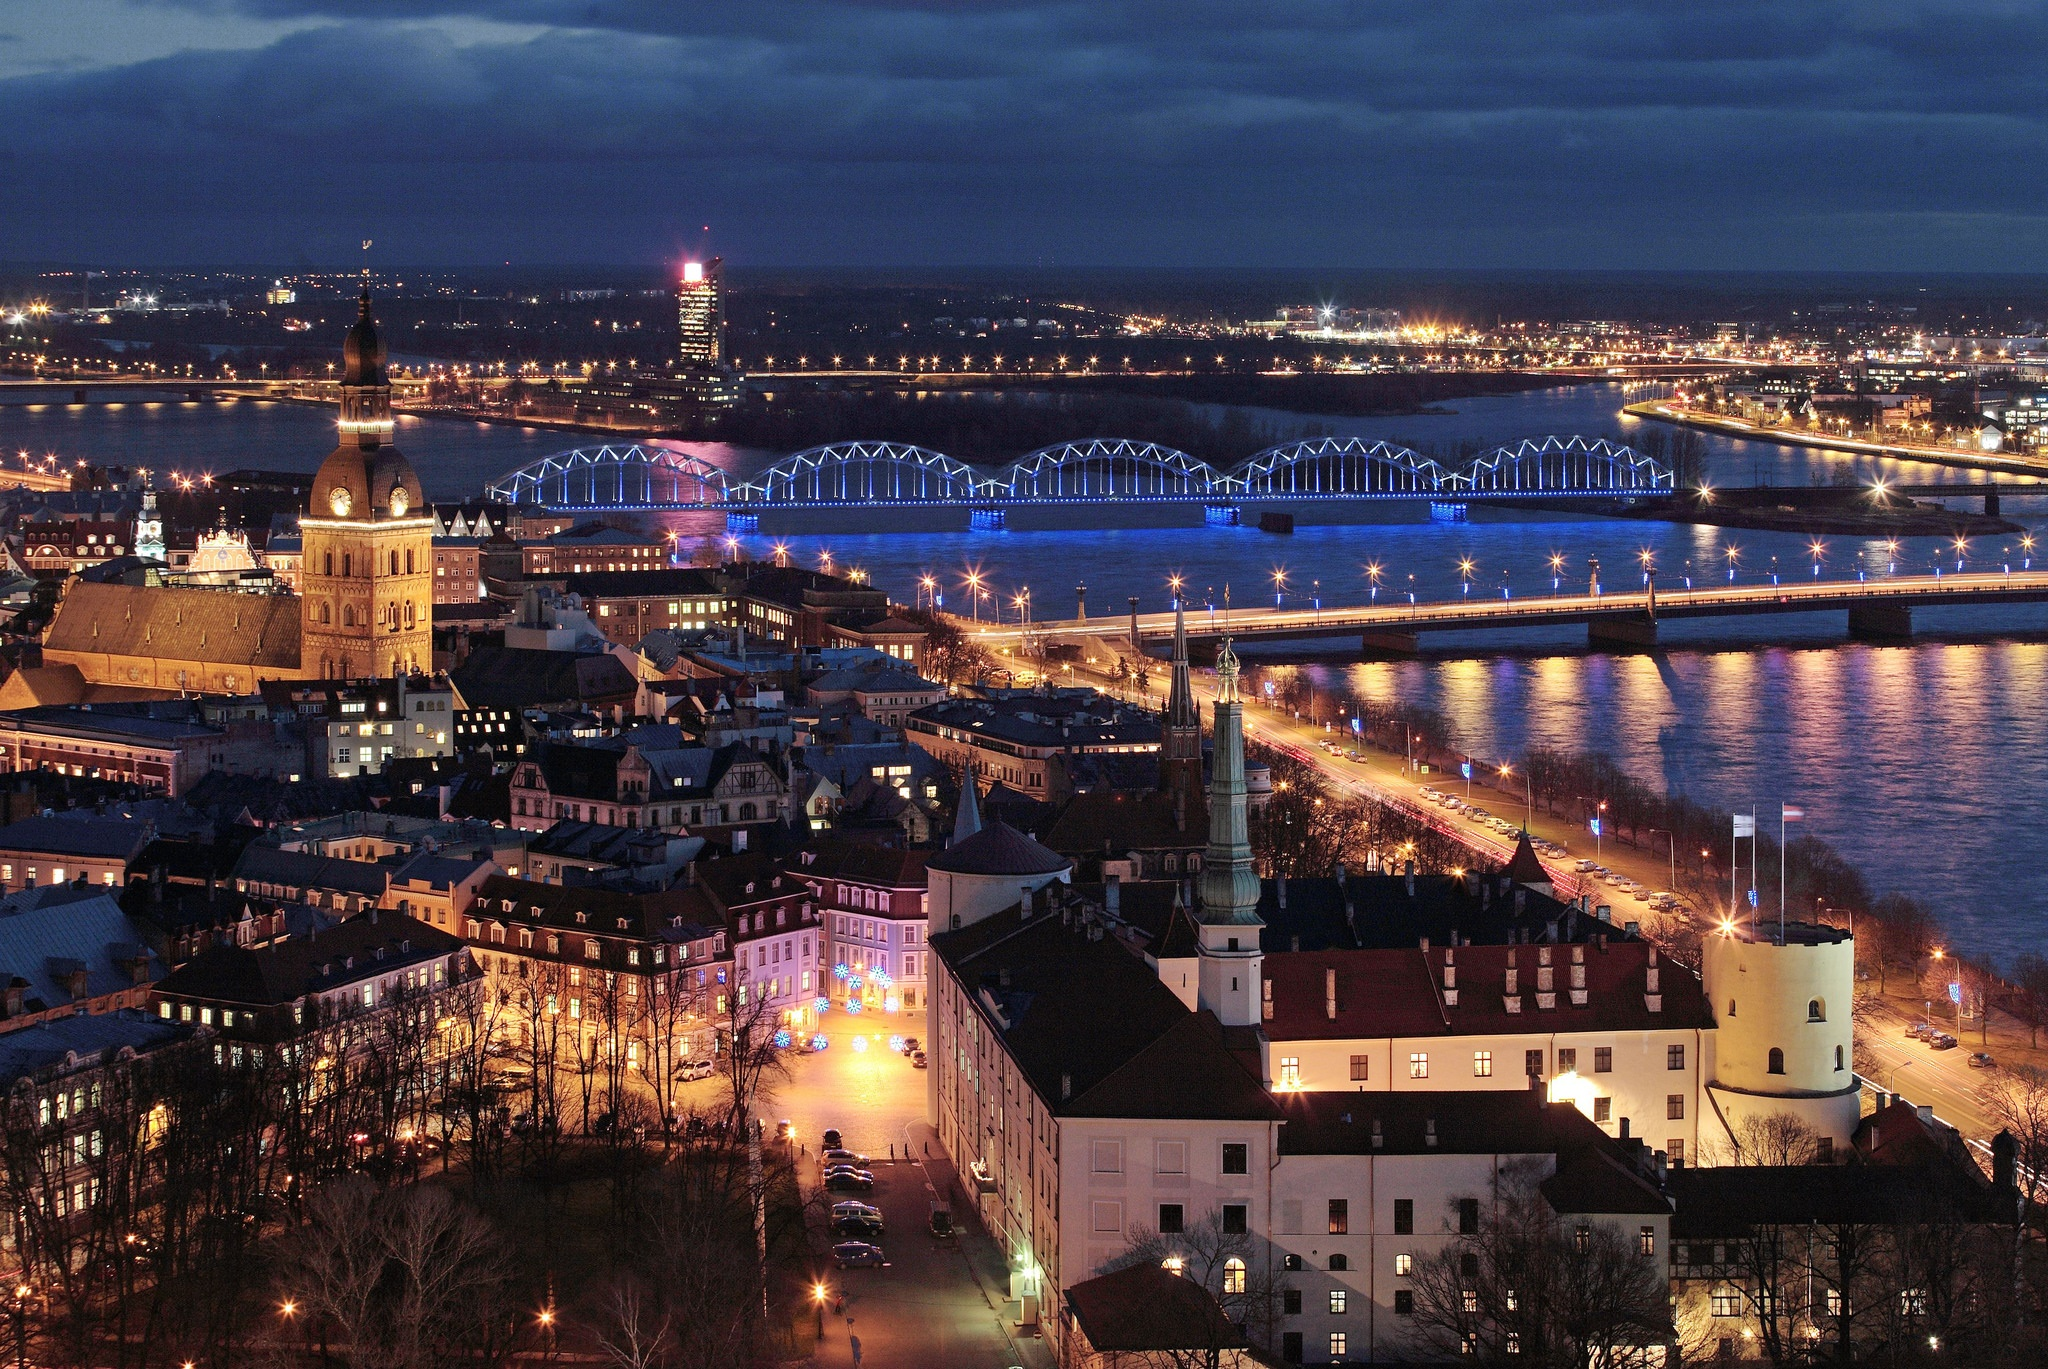 Old Riga in the Night, Aleksandrs Kendovs (Latvian Institute)